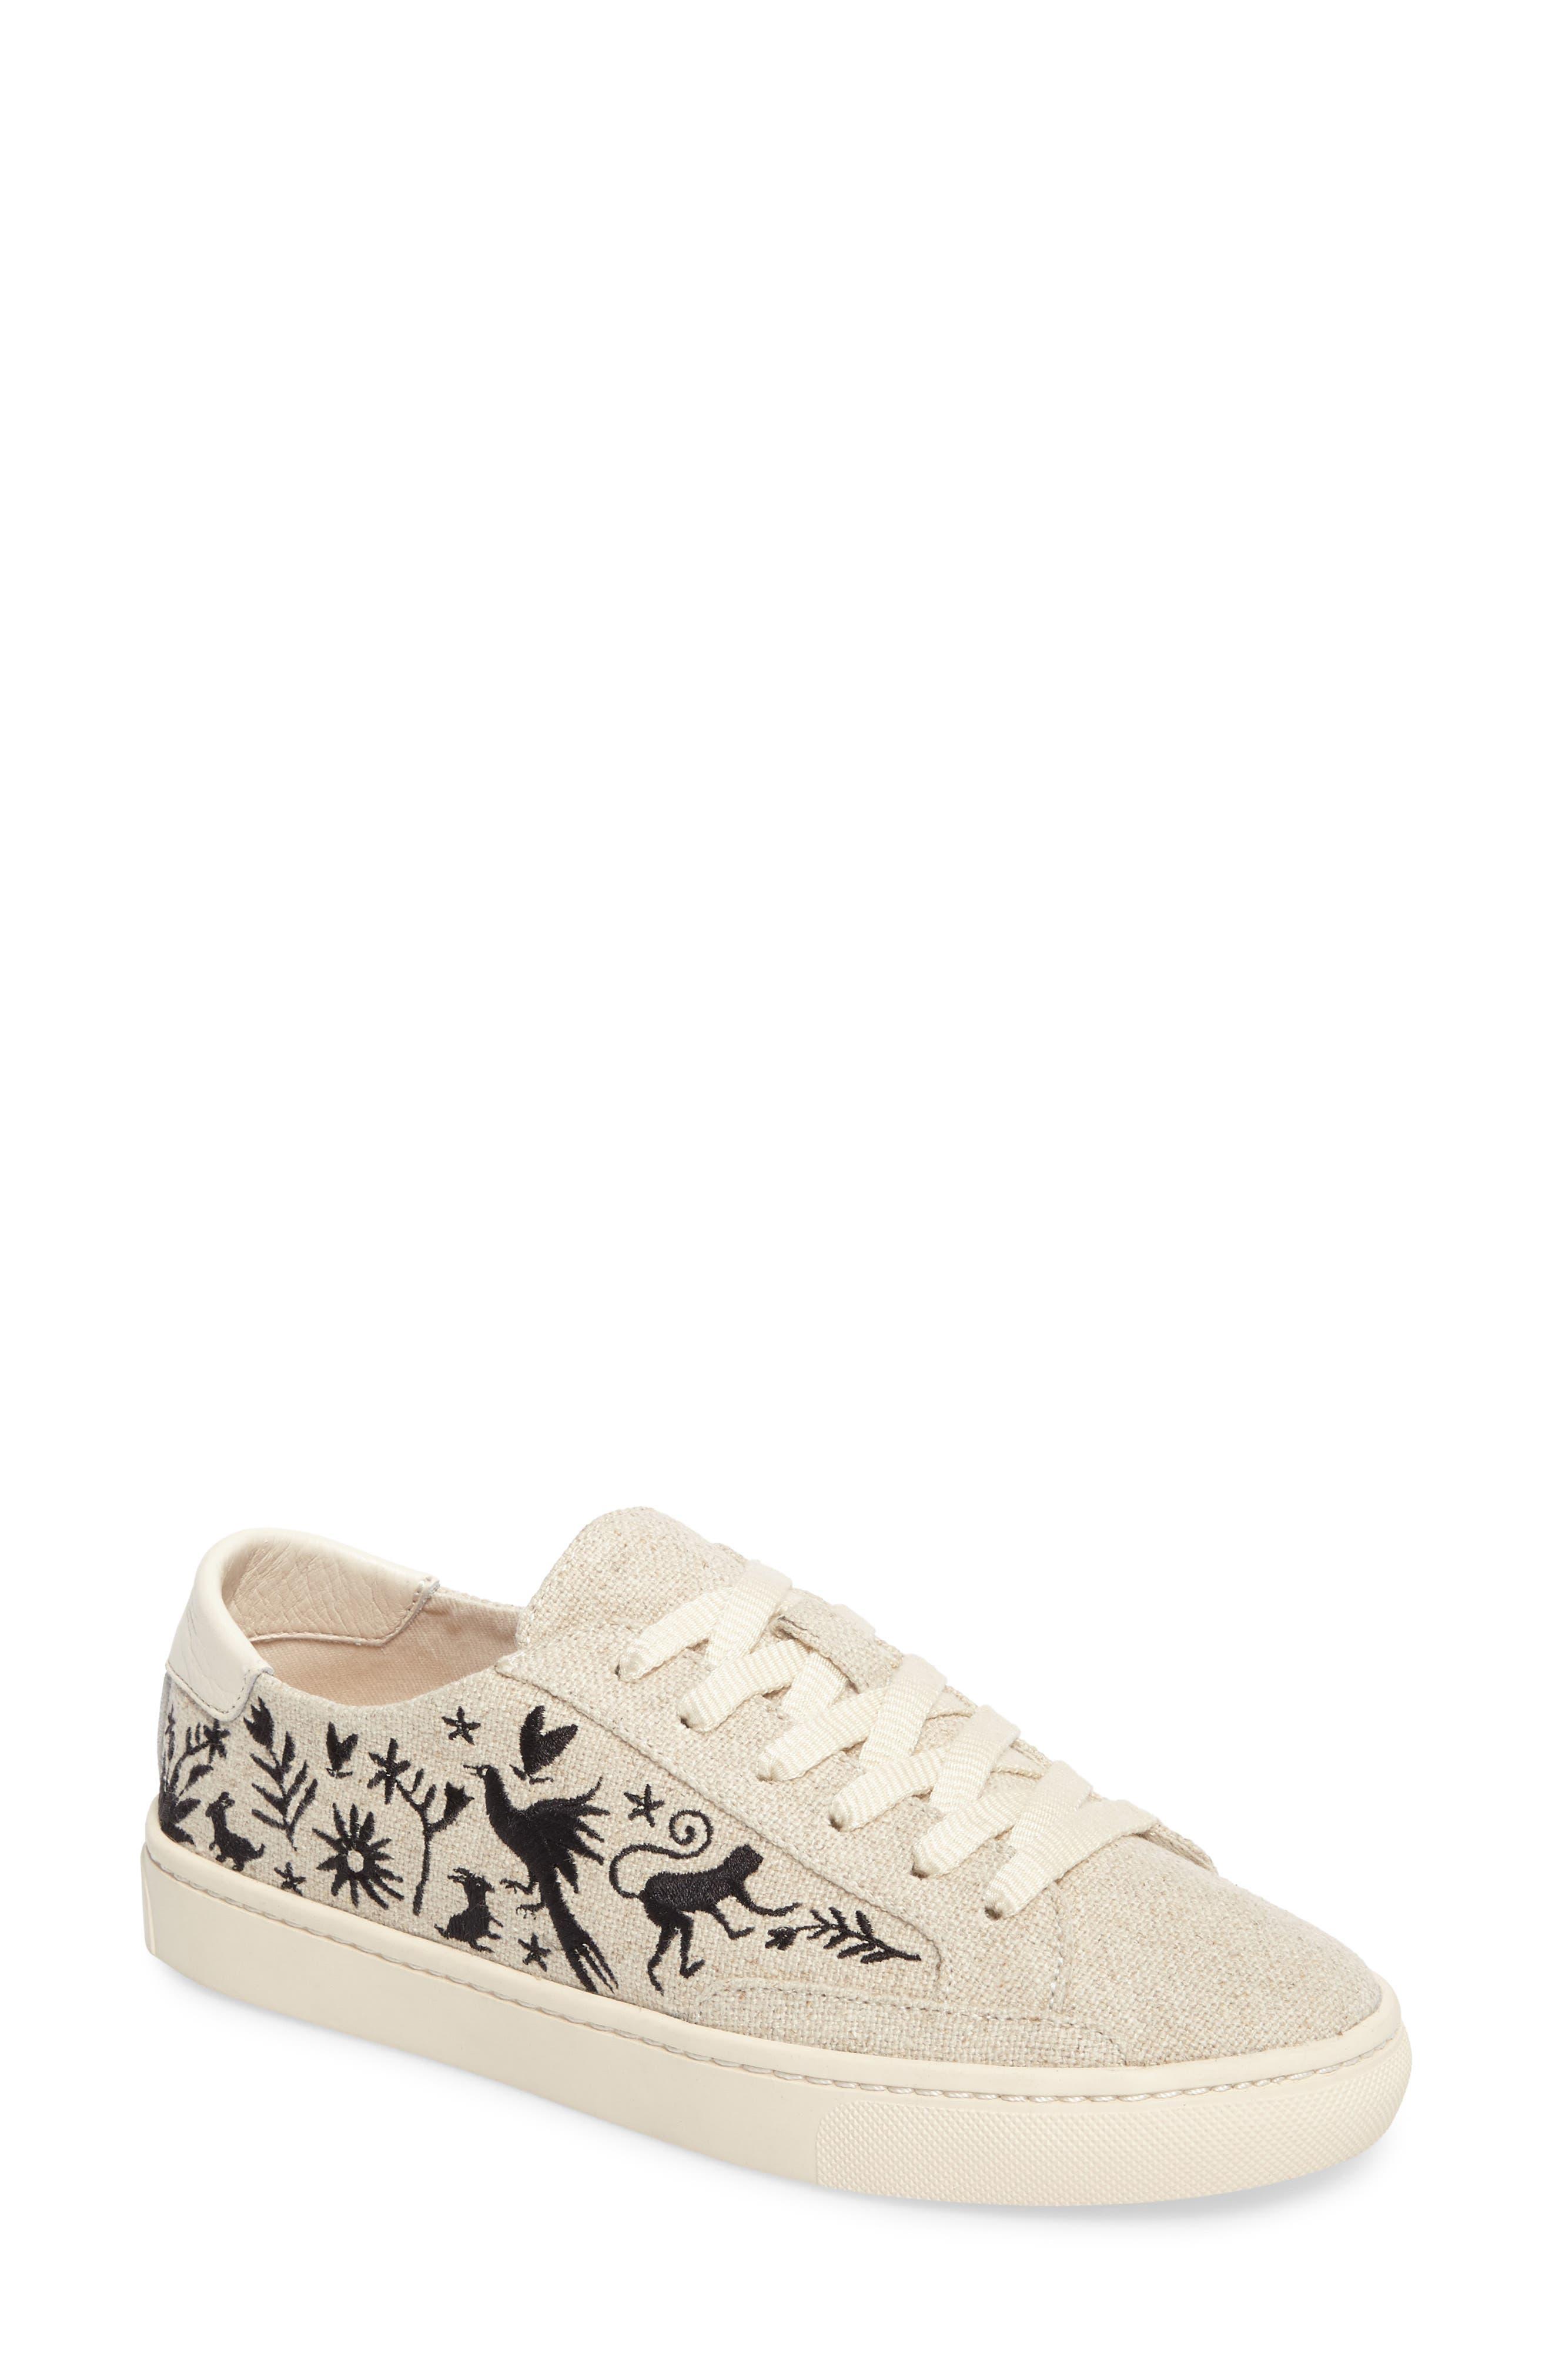 Otomi Sneaker,                         Main,                         color,